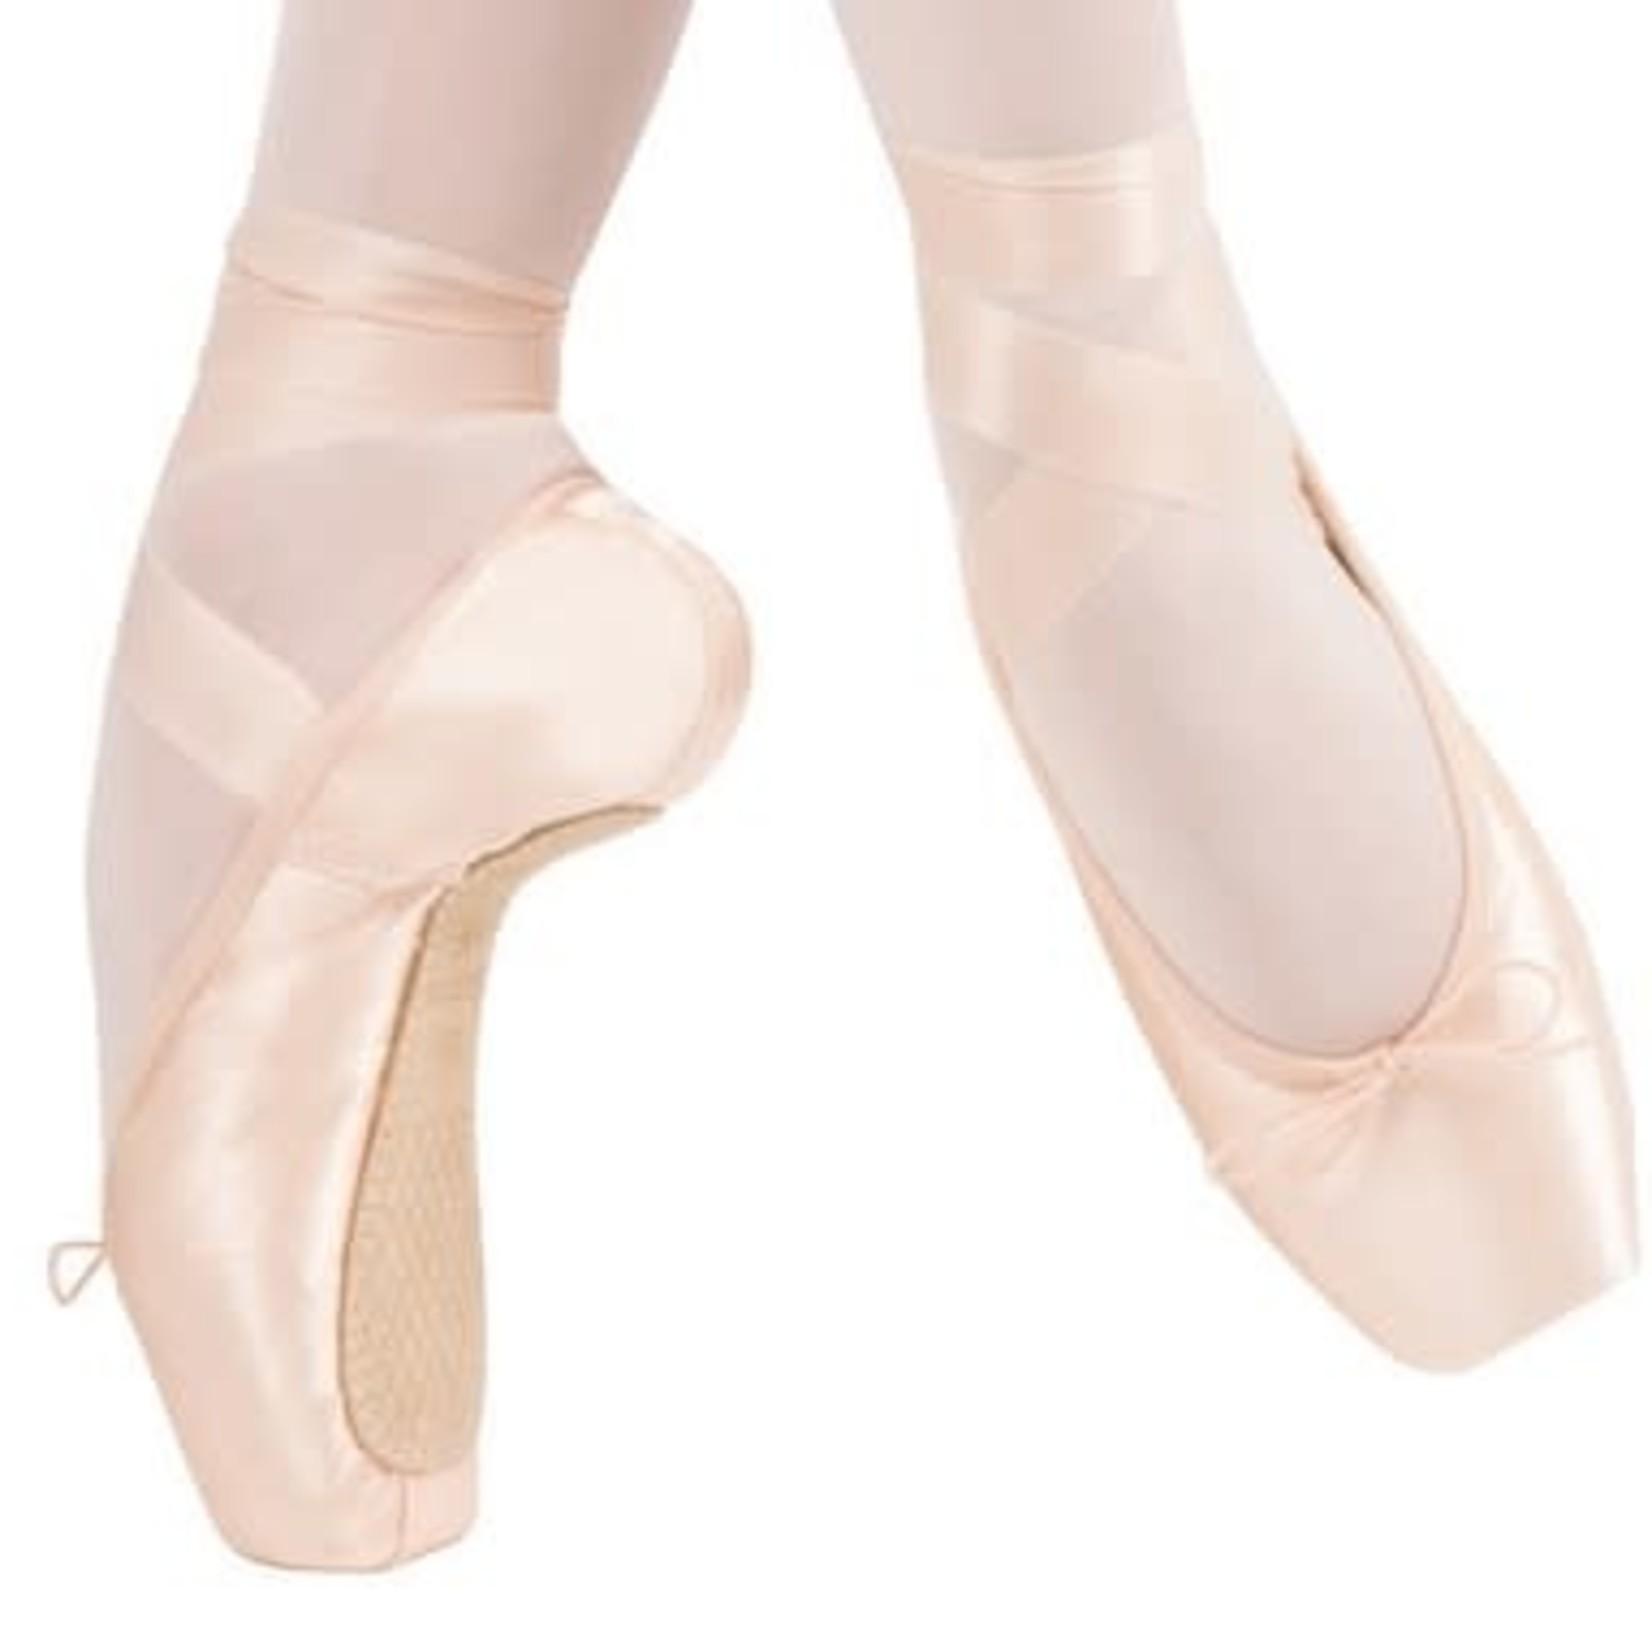 Nikolay Nikolay Dreampointe Pointe Shoes